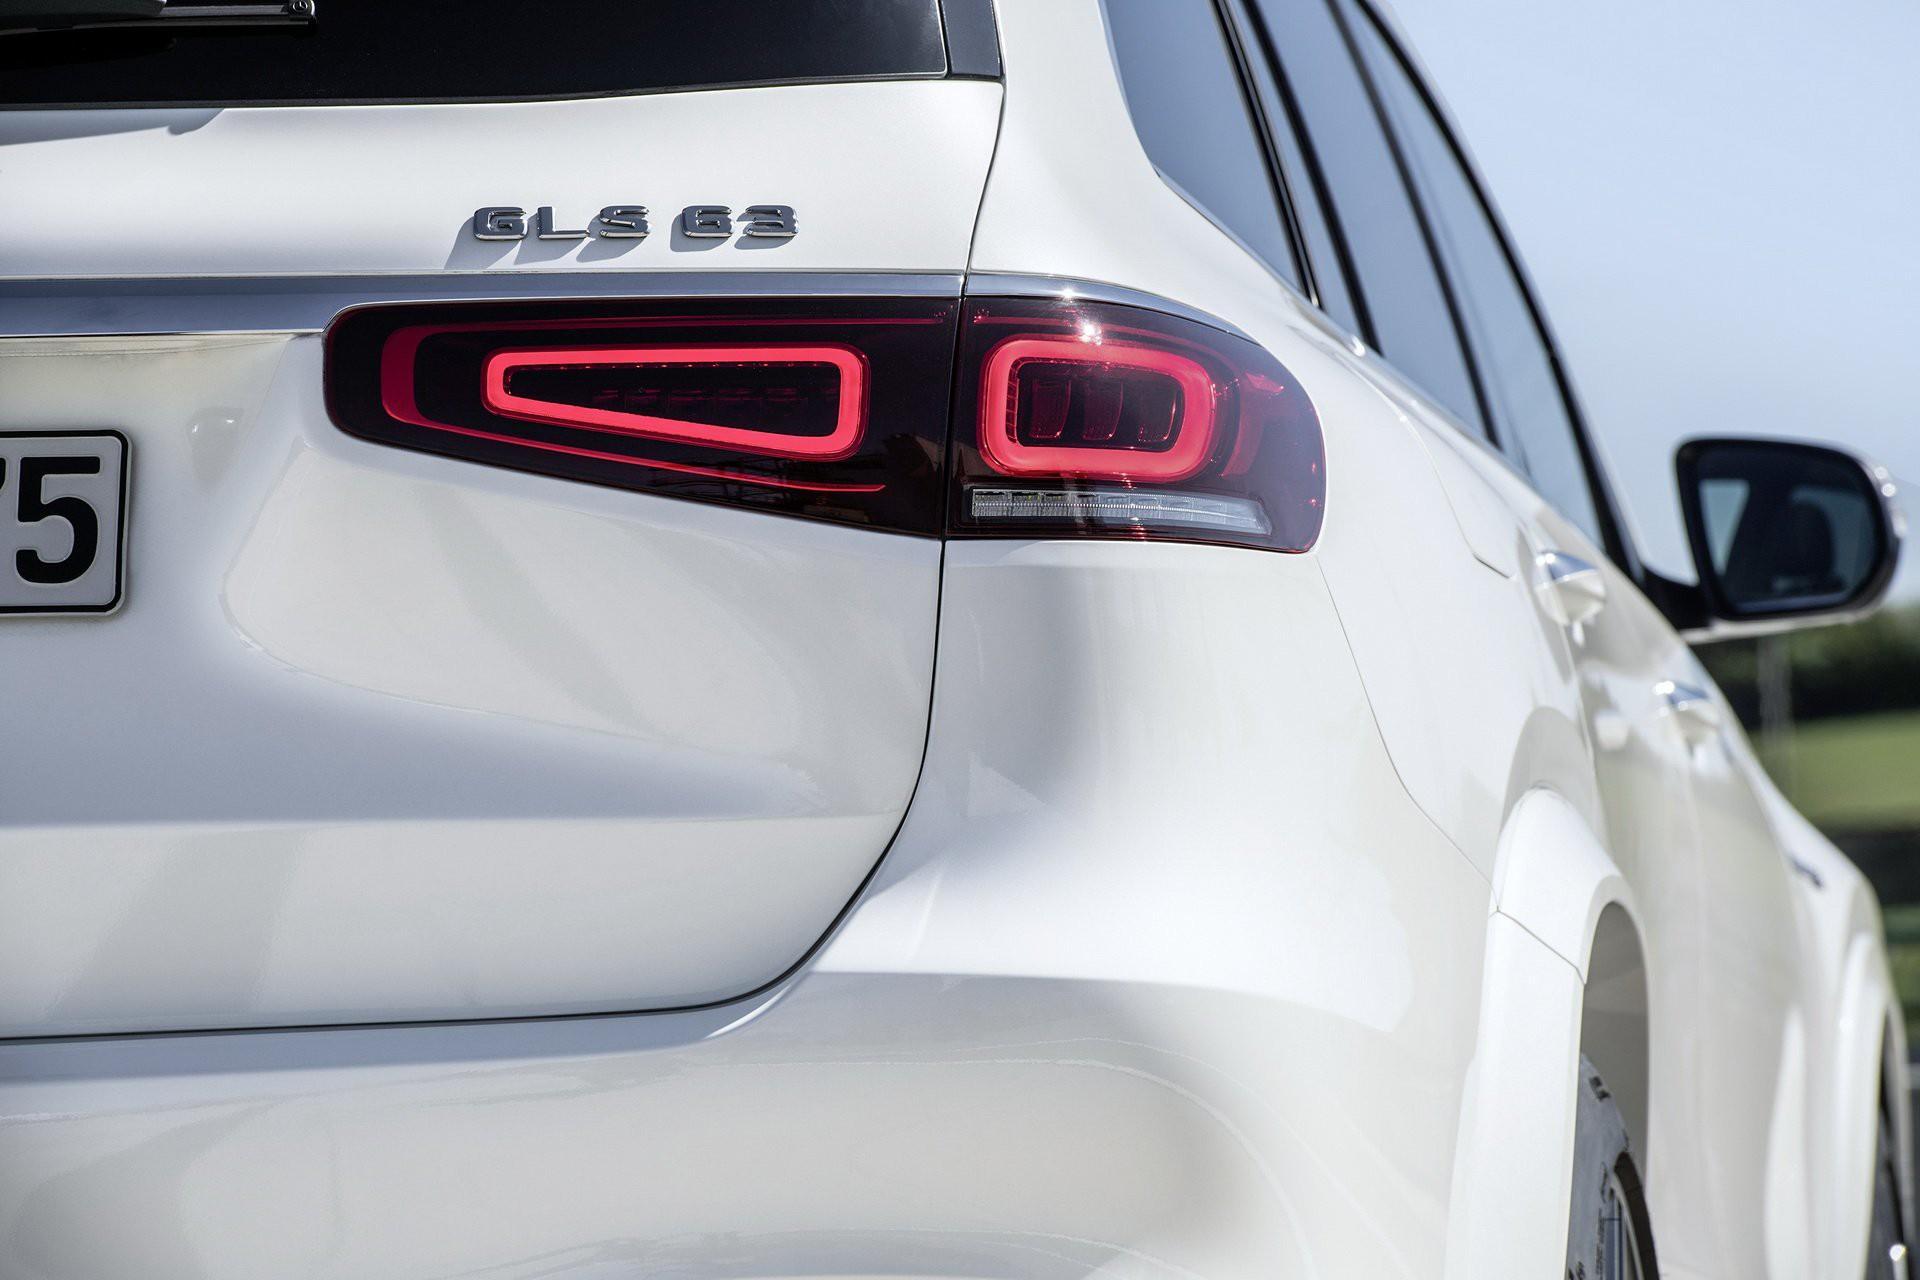 Khám phá Mercedes GLS 63 2020 vừa ra mắt Ảnh 7